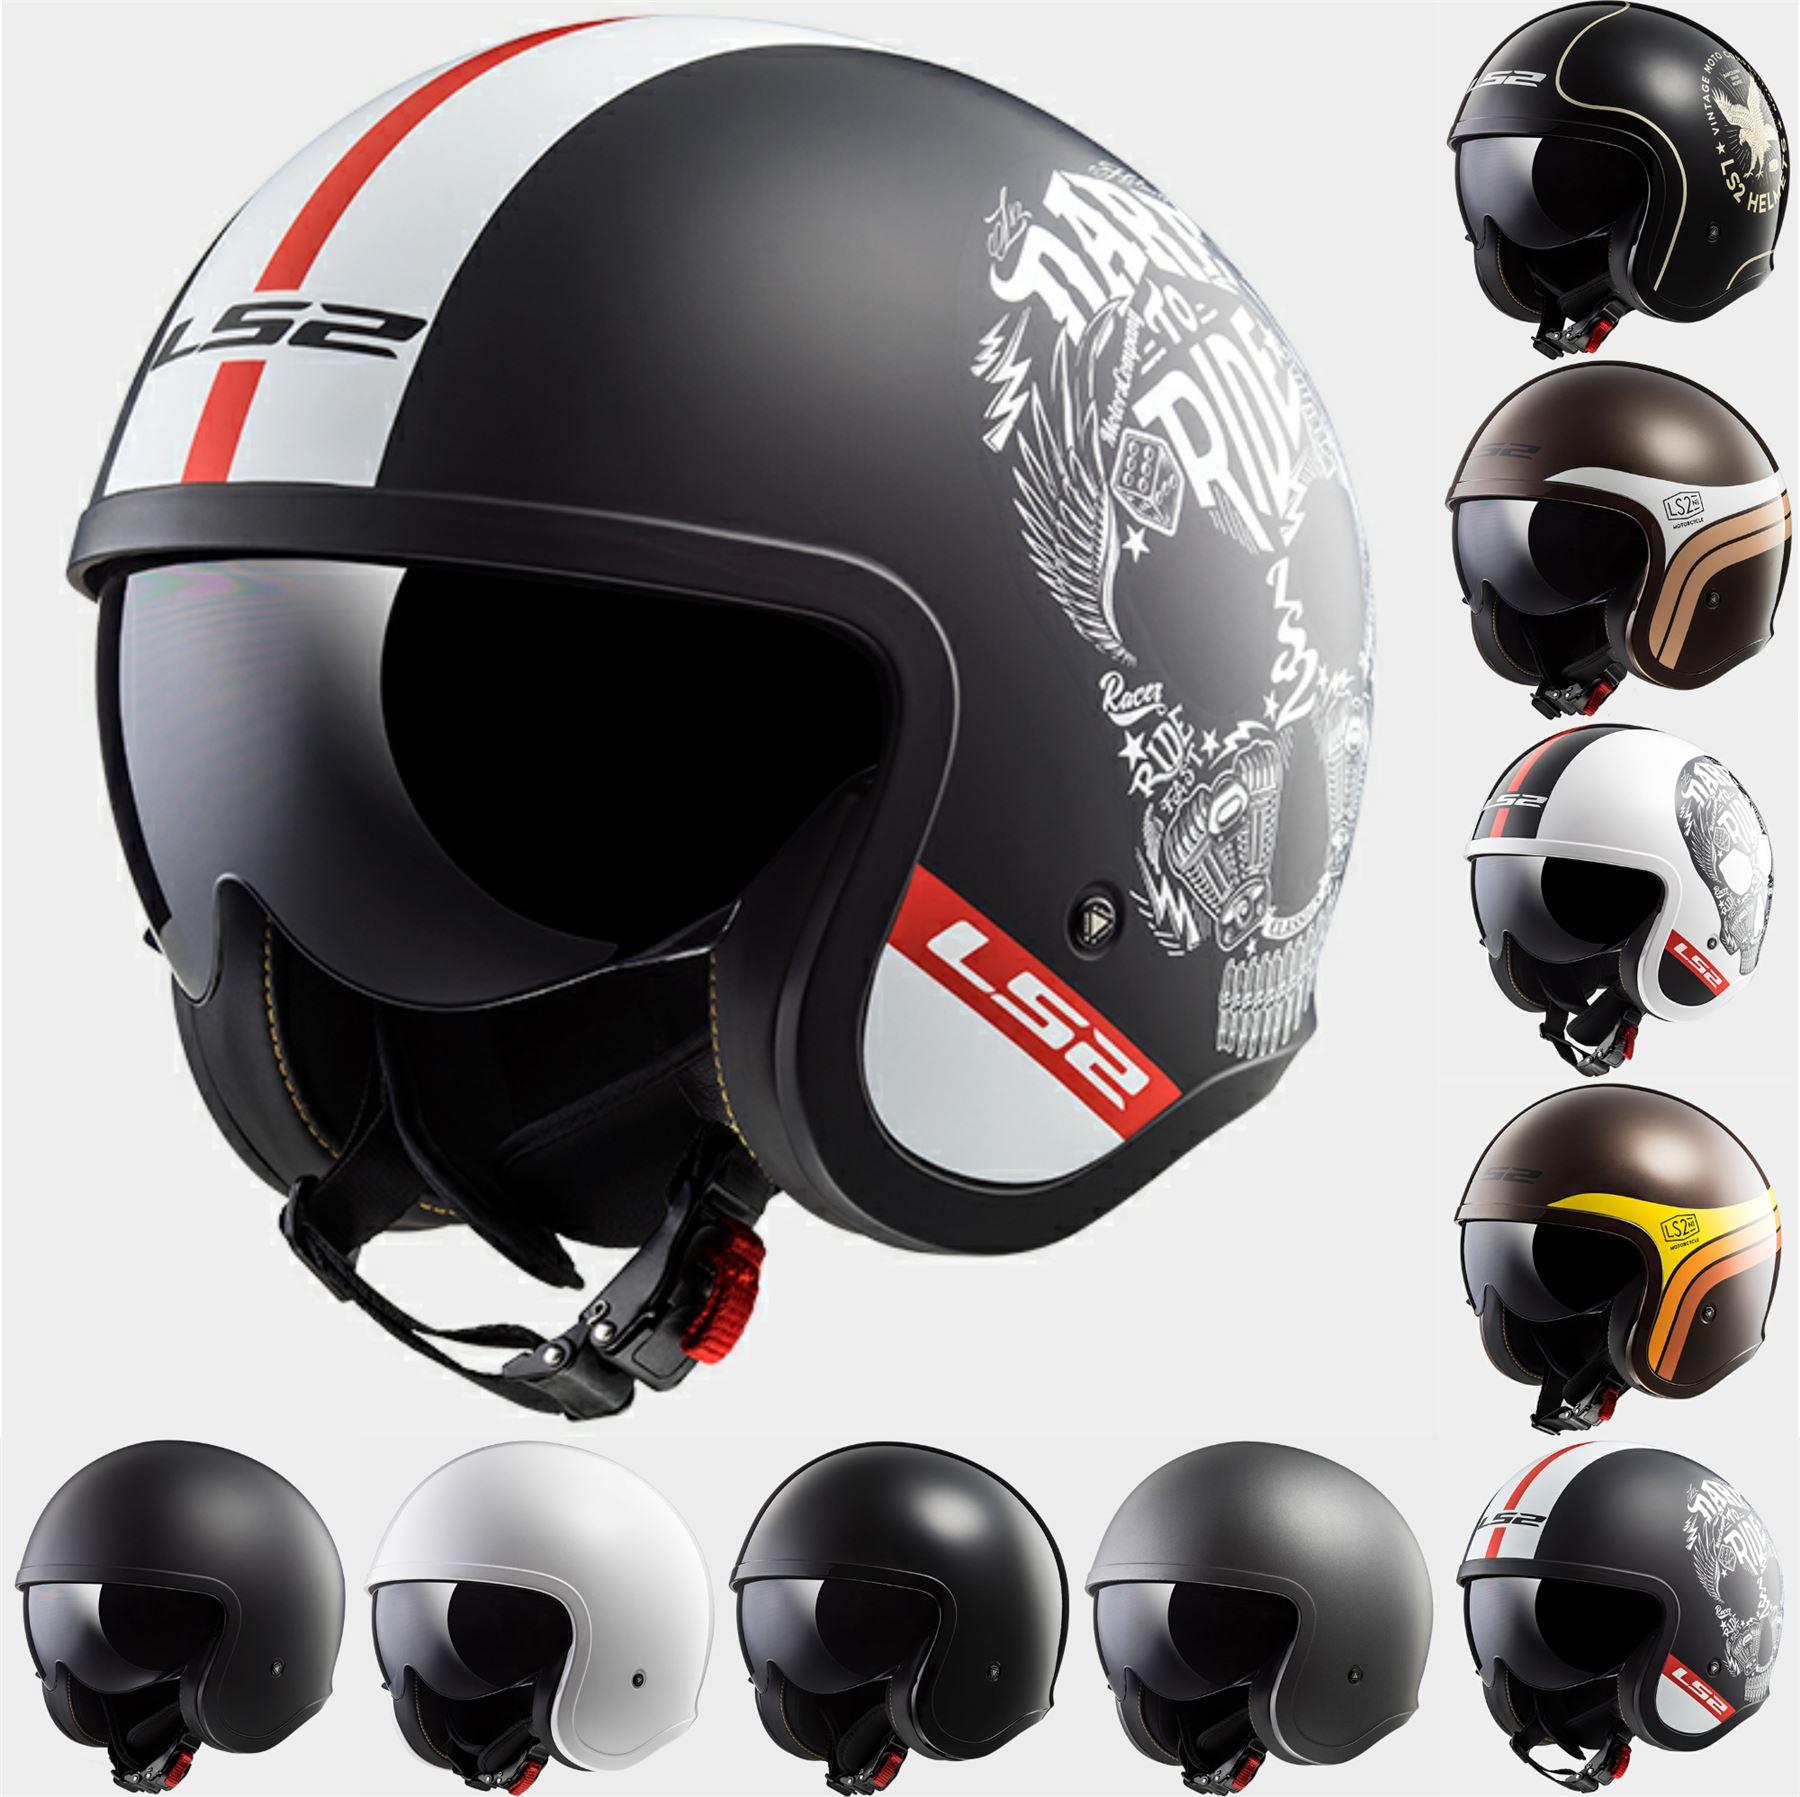 Ls2 Of599 Spitfire Motorcycle Open Face Urban Scooter Helmet Ebay